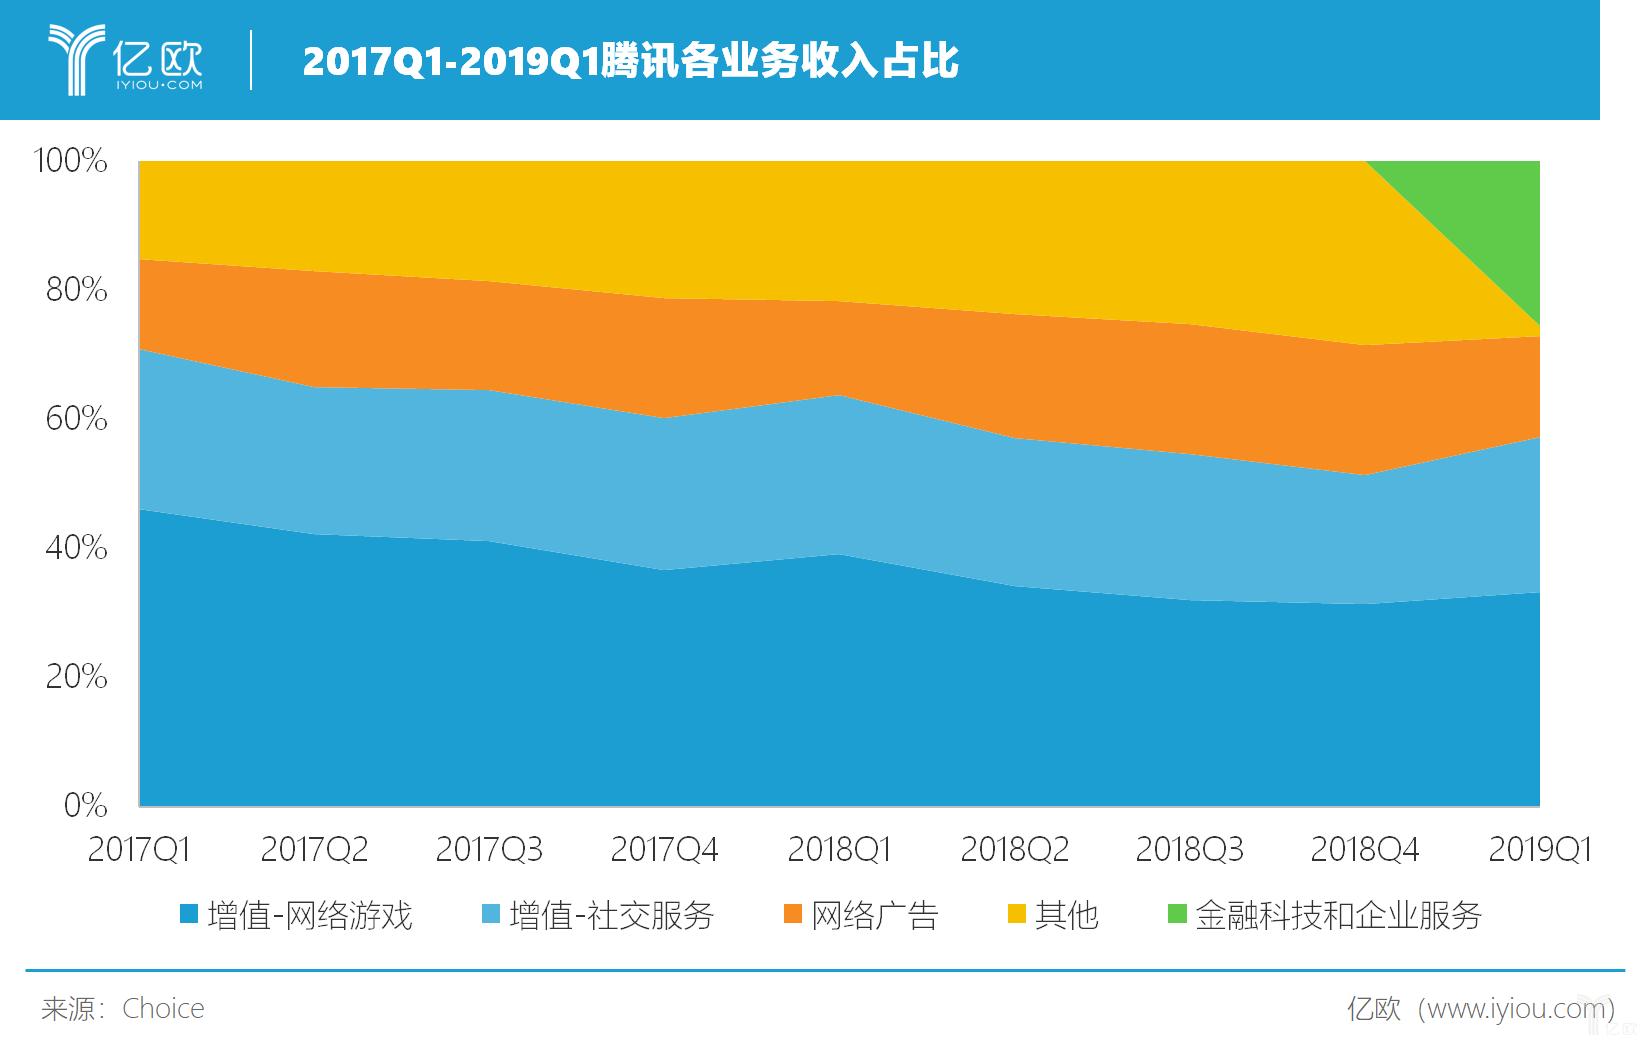 2017Q1-2019Q1腾讯各业务收入占比